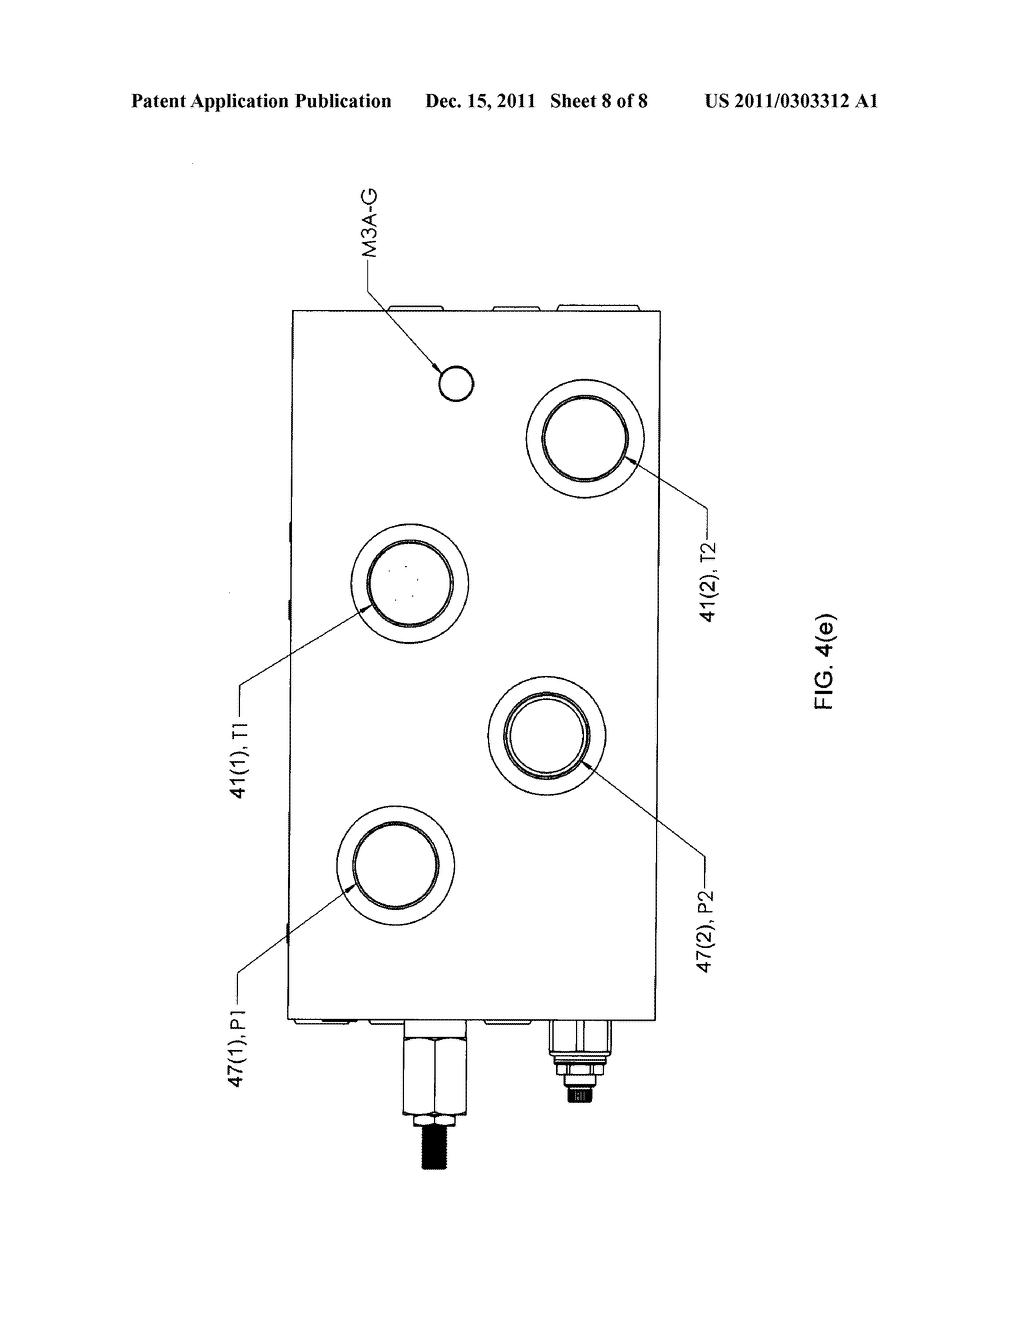 binary hydraulic manifold system diagram schematic and image 09 rh patentsencyclopedia com